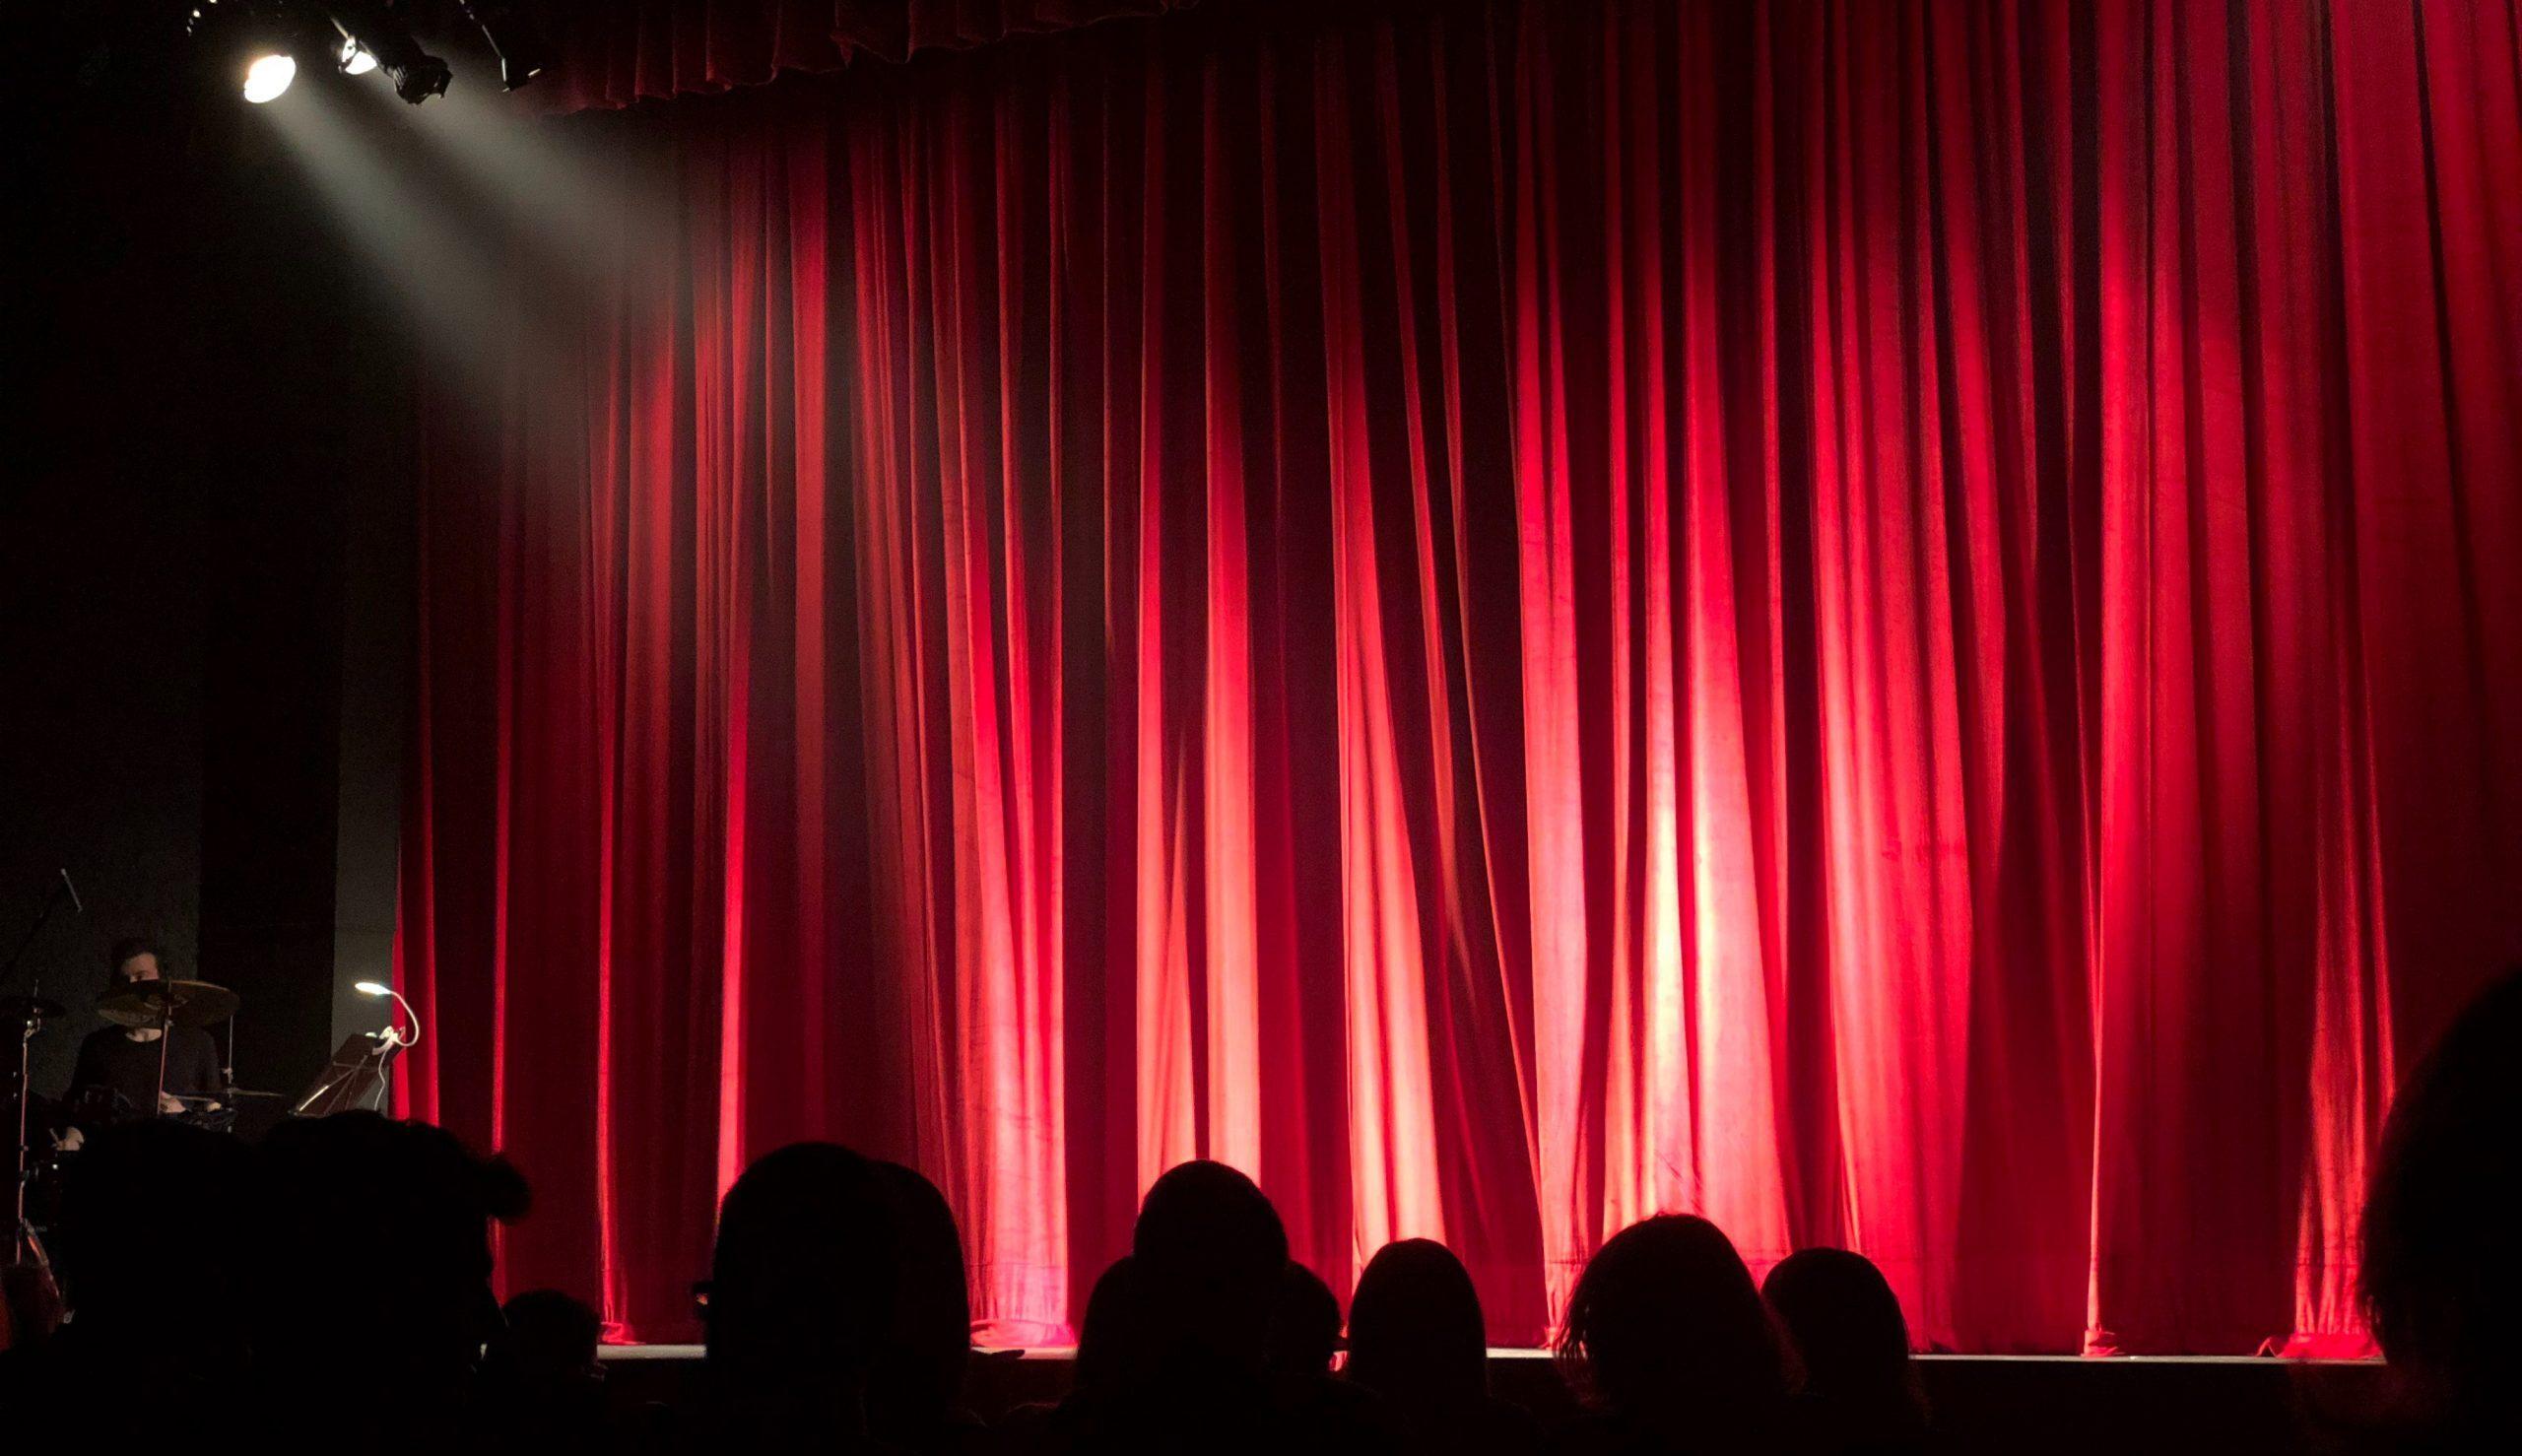 Theatre Stage Lighting